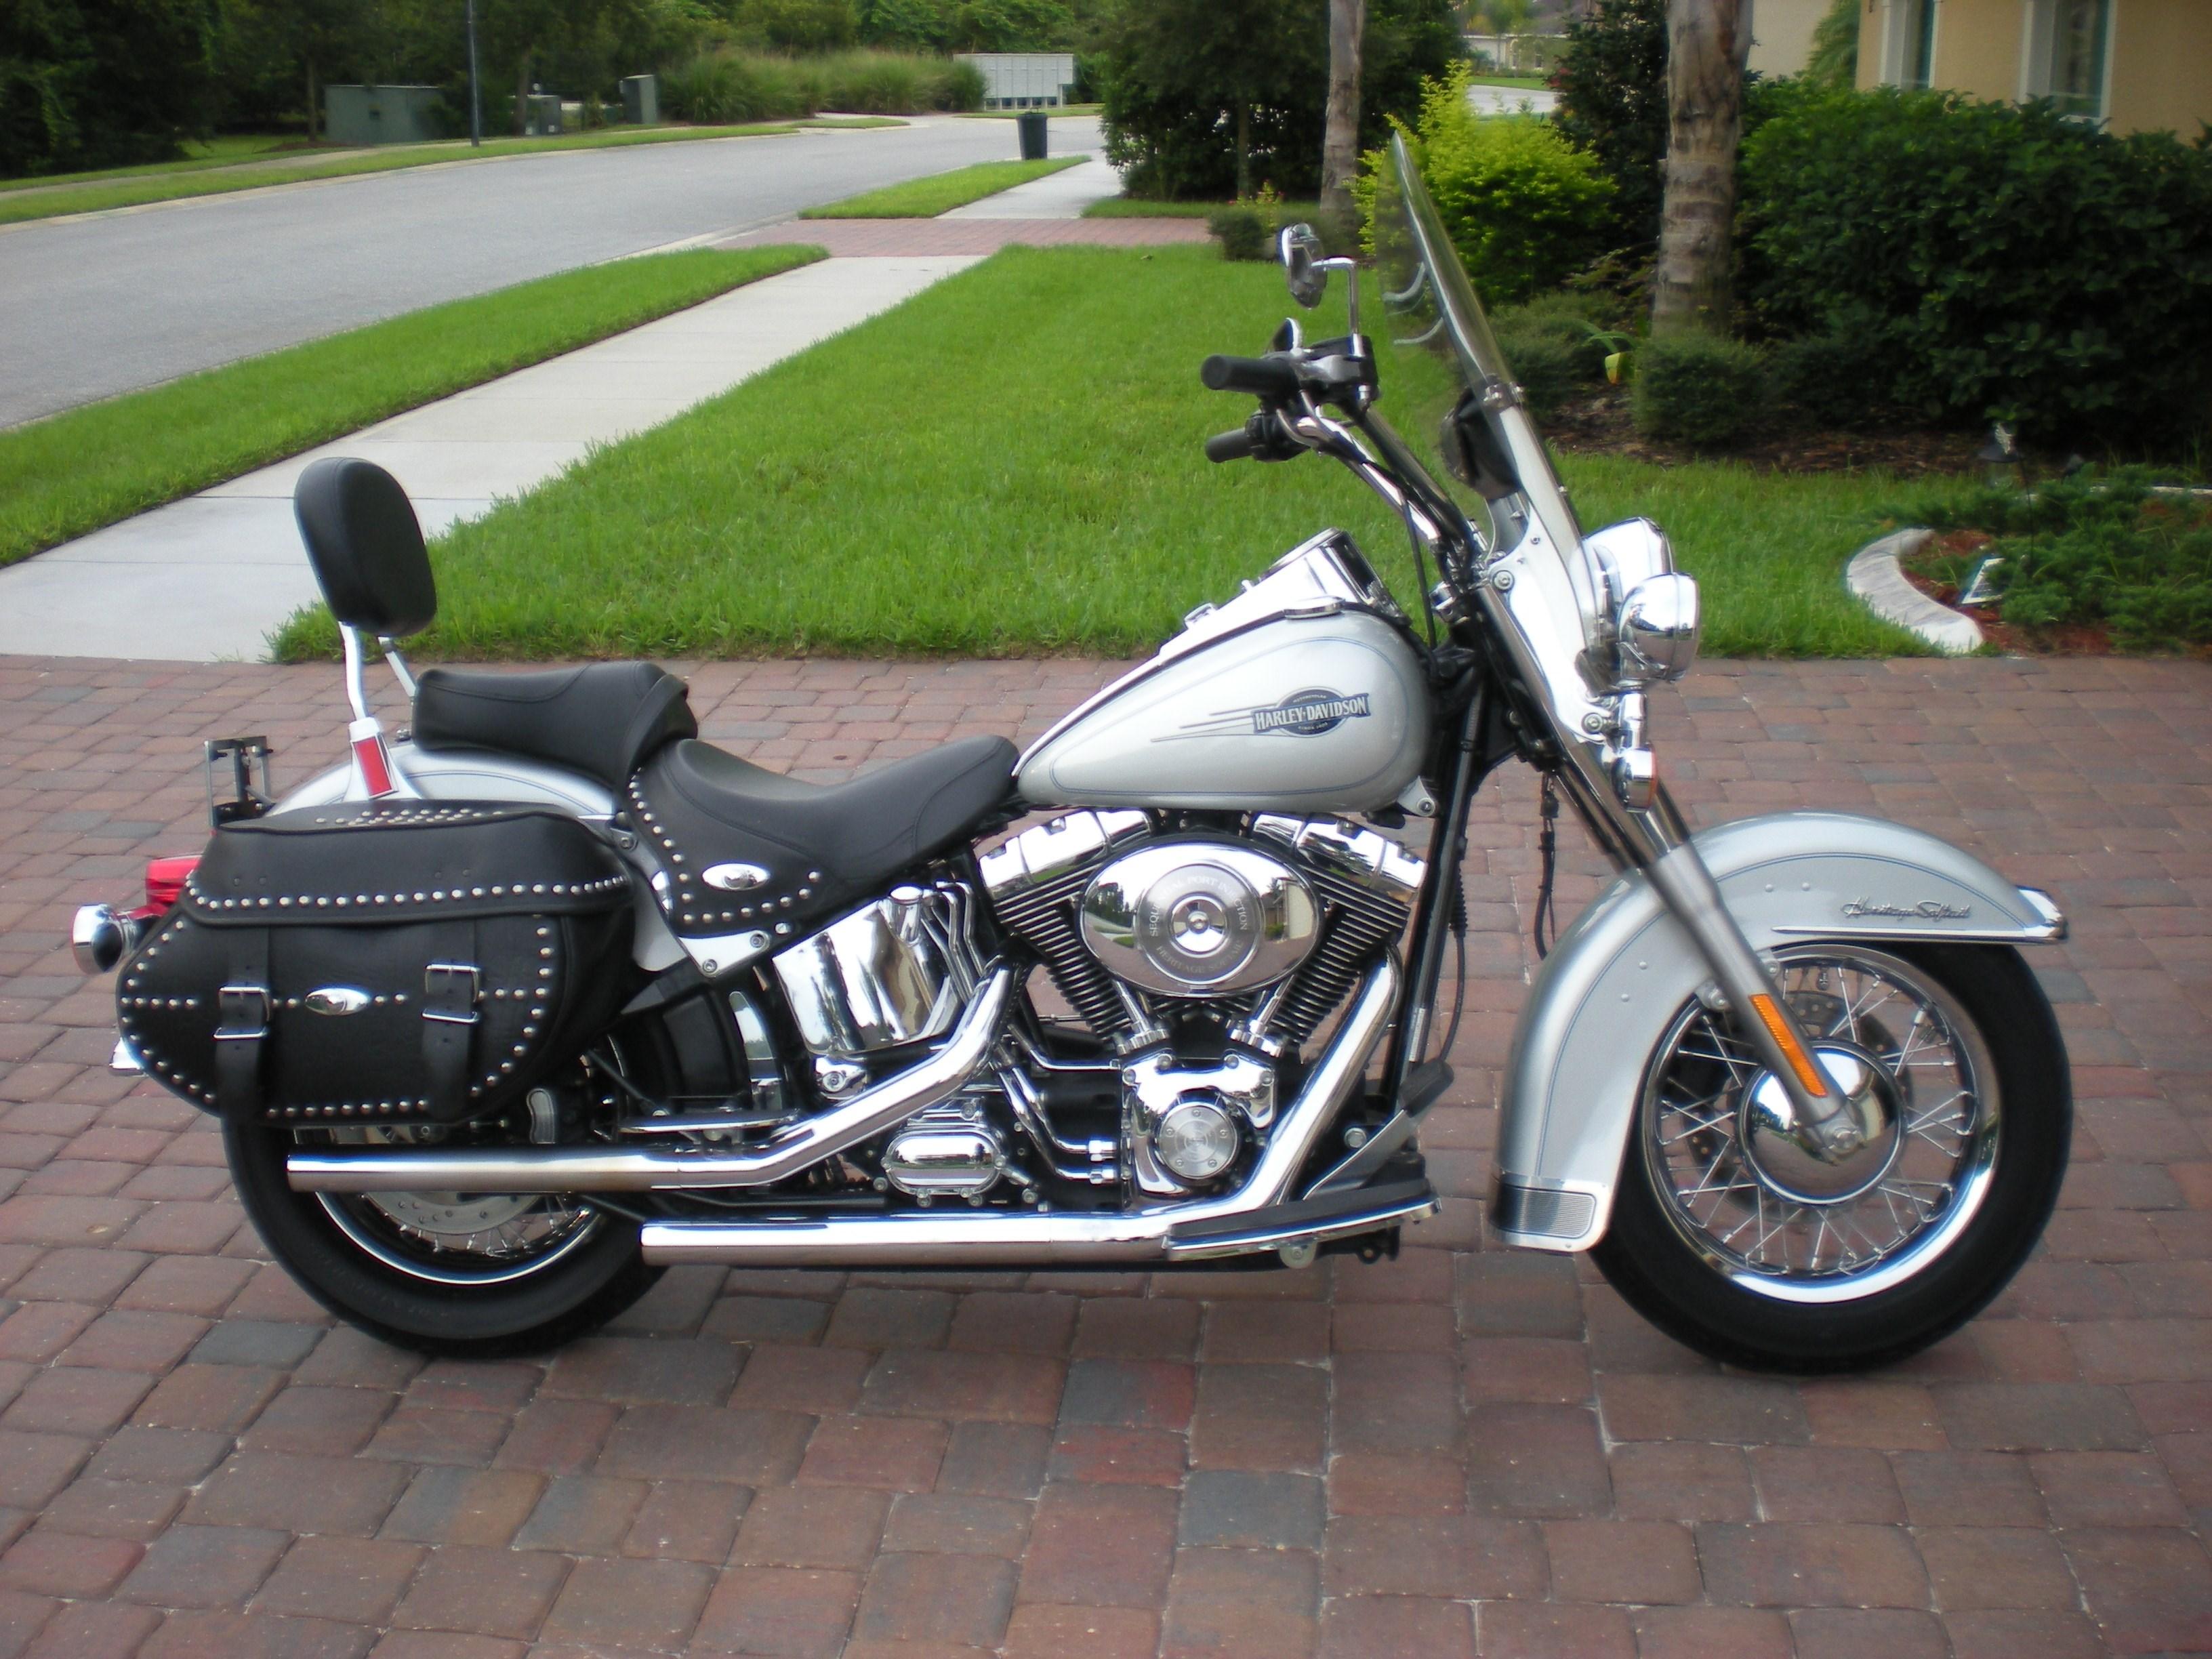 Harley Davidson Of Greenville >> 2006 Harley-Davidson® FLSTC/I Heritage Softail® Classic (Silver), palm coast, Florida (577202 ...